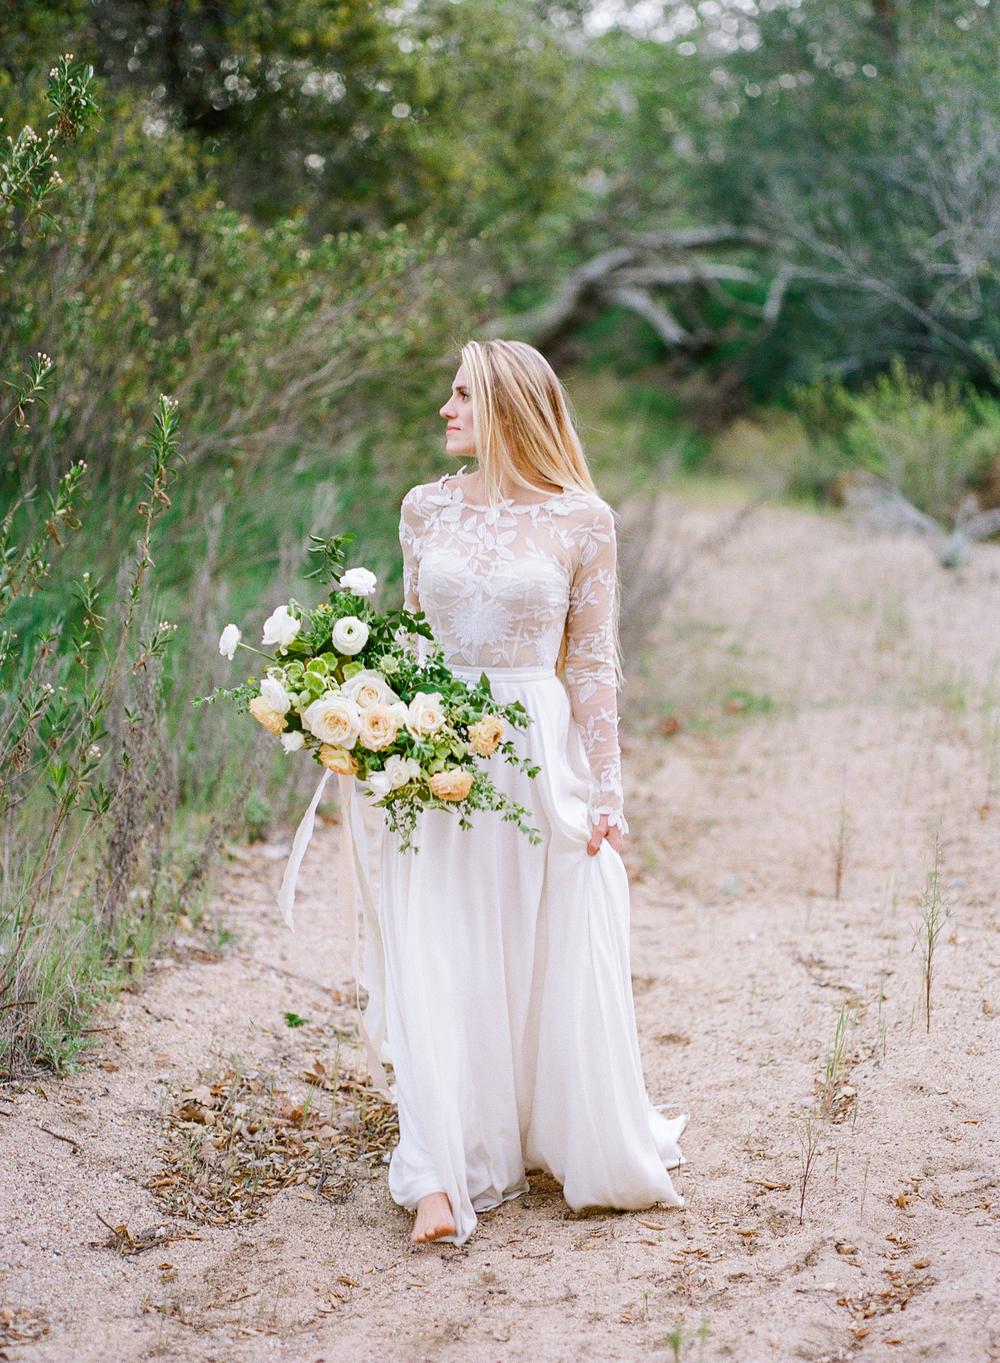 015-Jen-Wojcik-Photography-San-Diego-Photographer.jpg